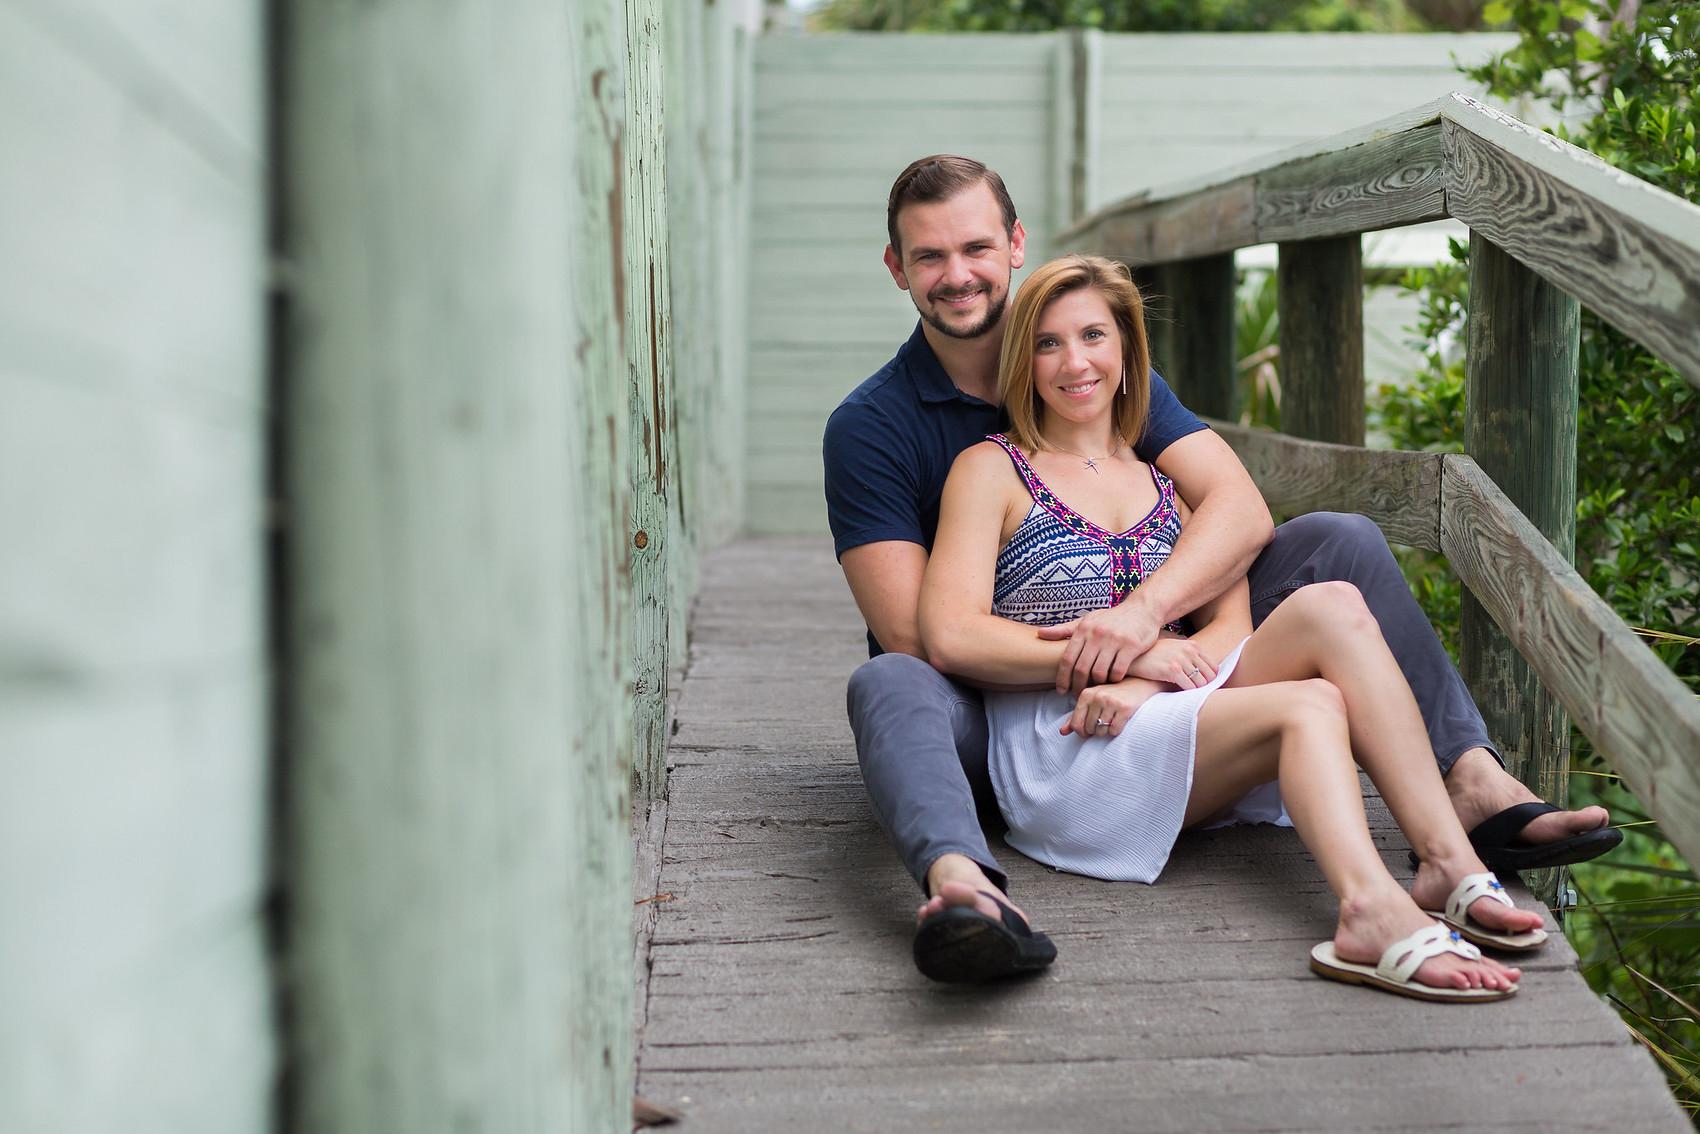 adam-szarmack-jacksonville-wedding-photographer-atlantic-beach-engagement-pictures-17.jpg